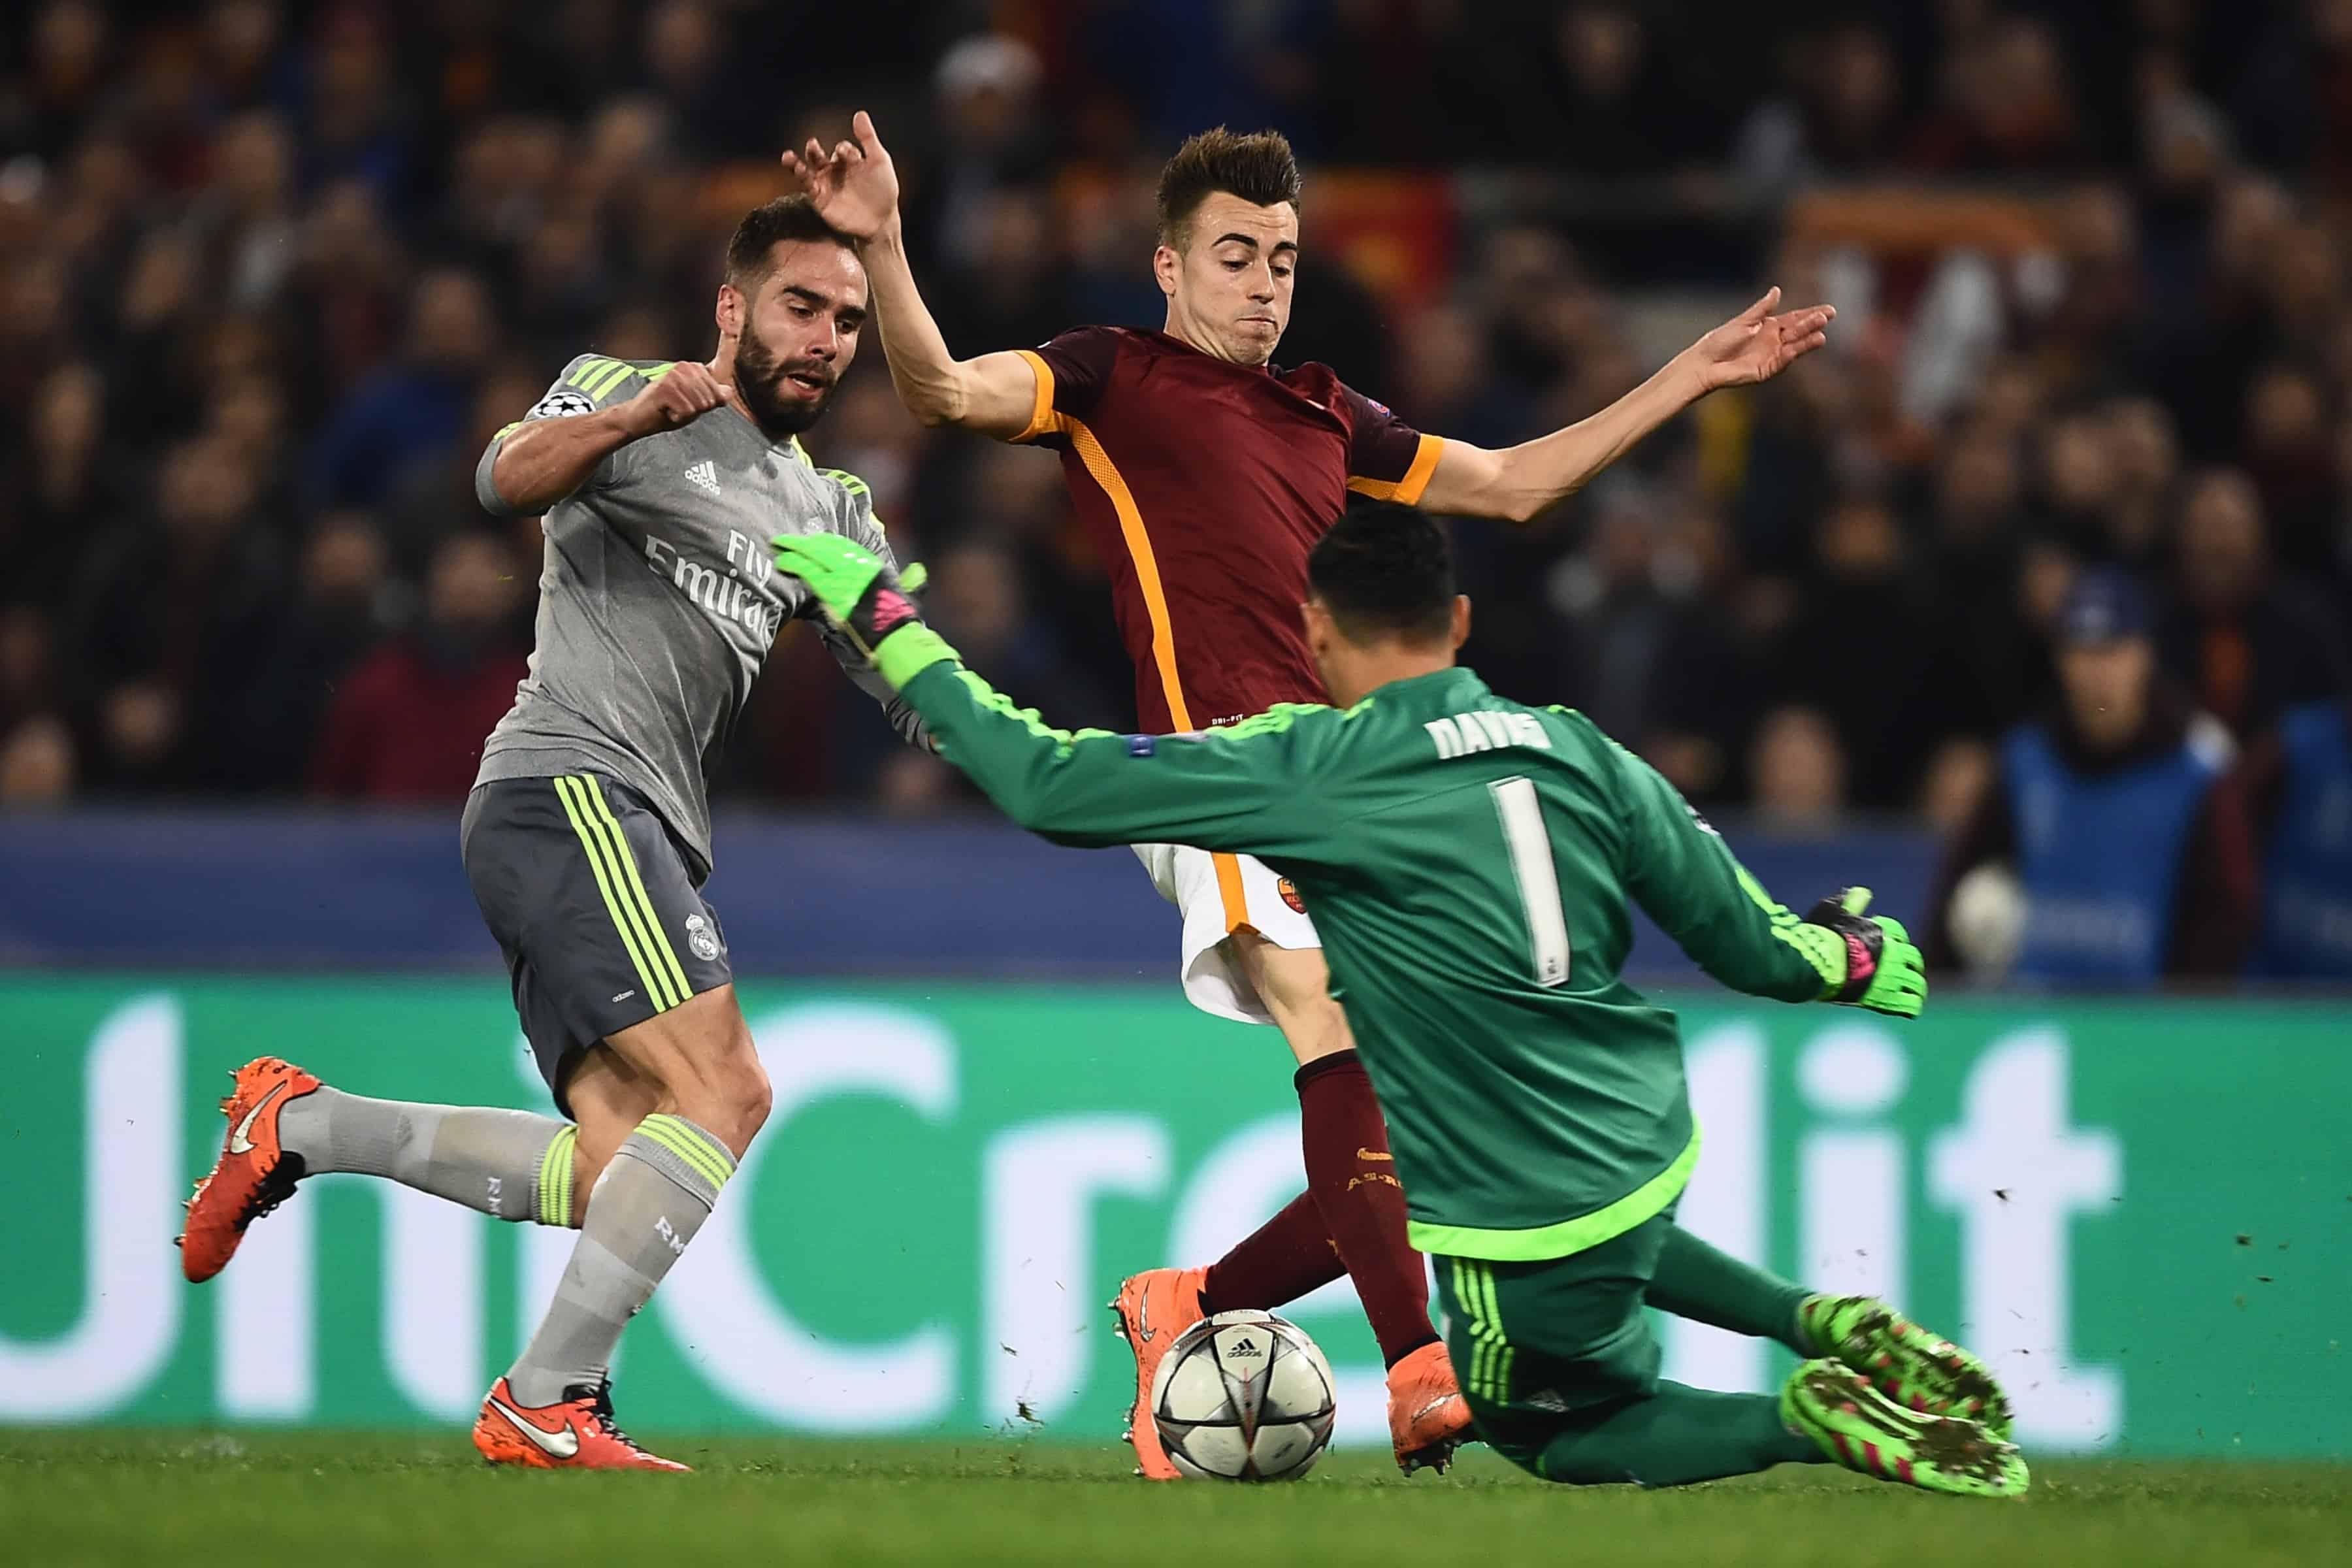 Costa Rican Keylor Navas keeps historic Champions League shutout